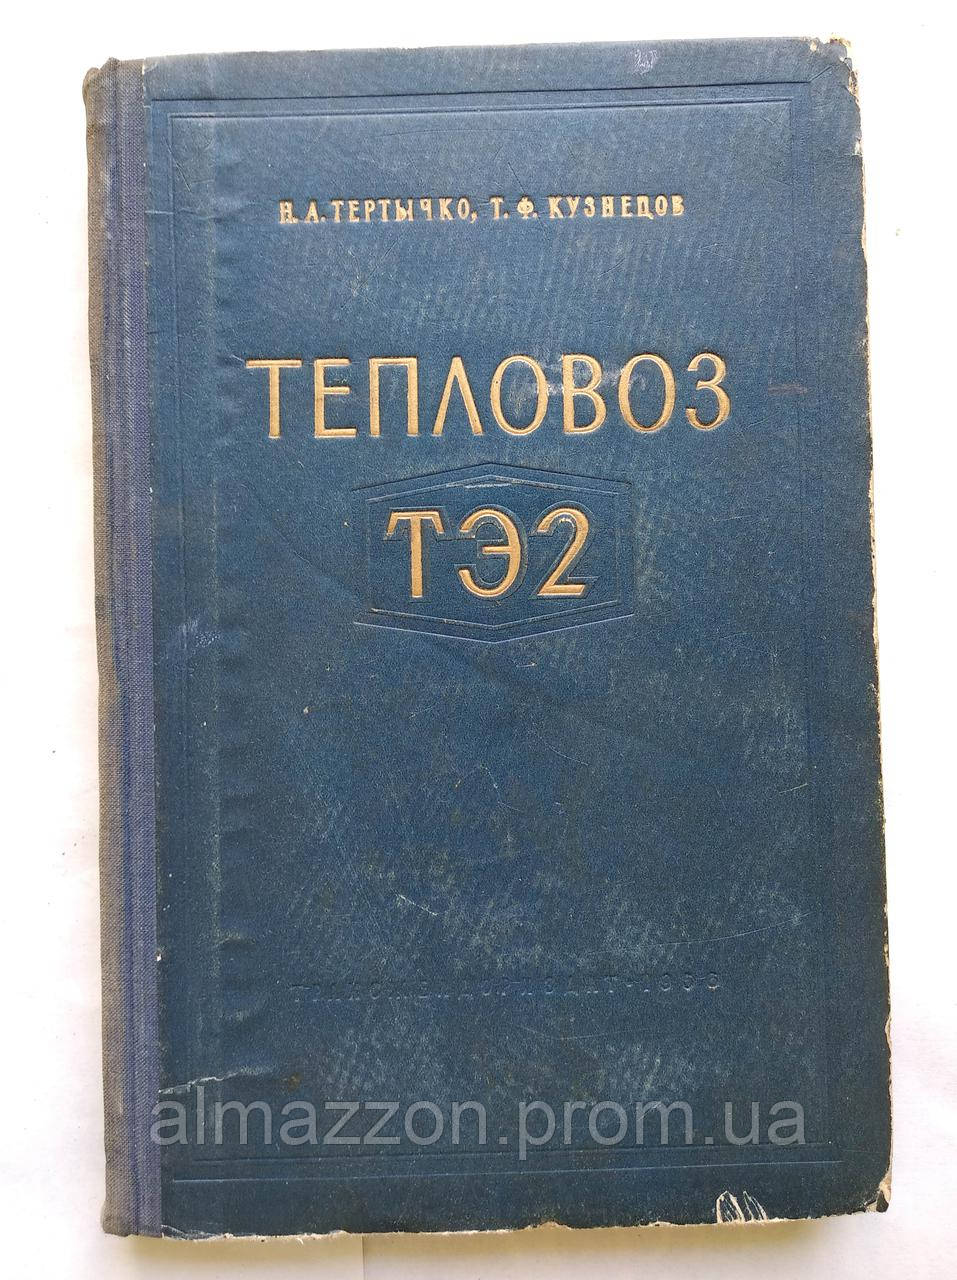 Н.Тертычко Тепловоз ТЭ2 (устройство, уход и ремонт)